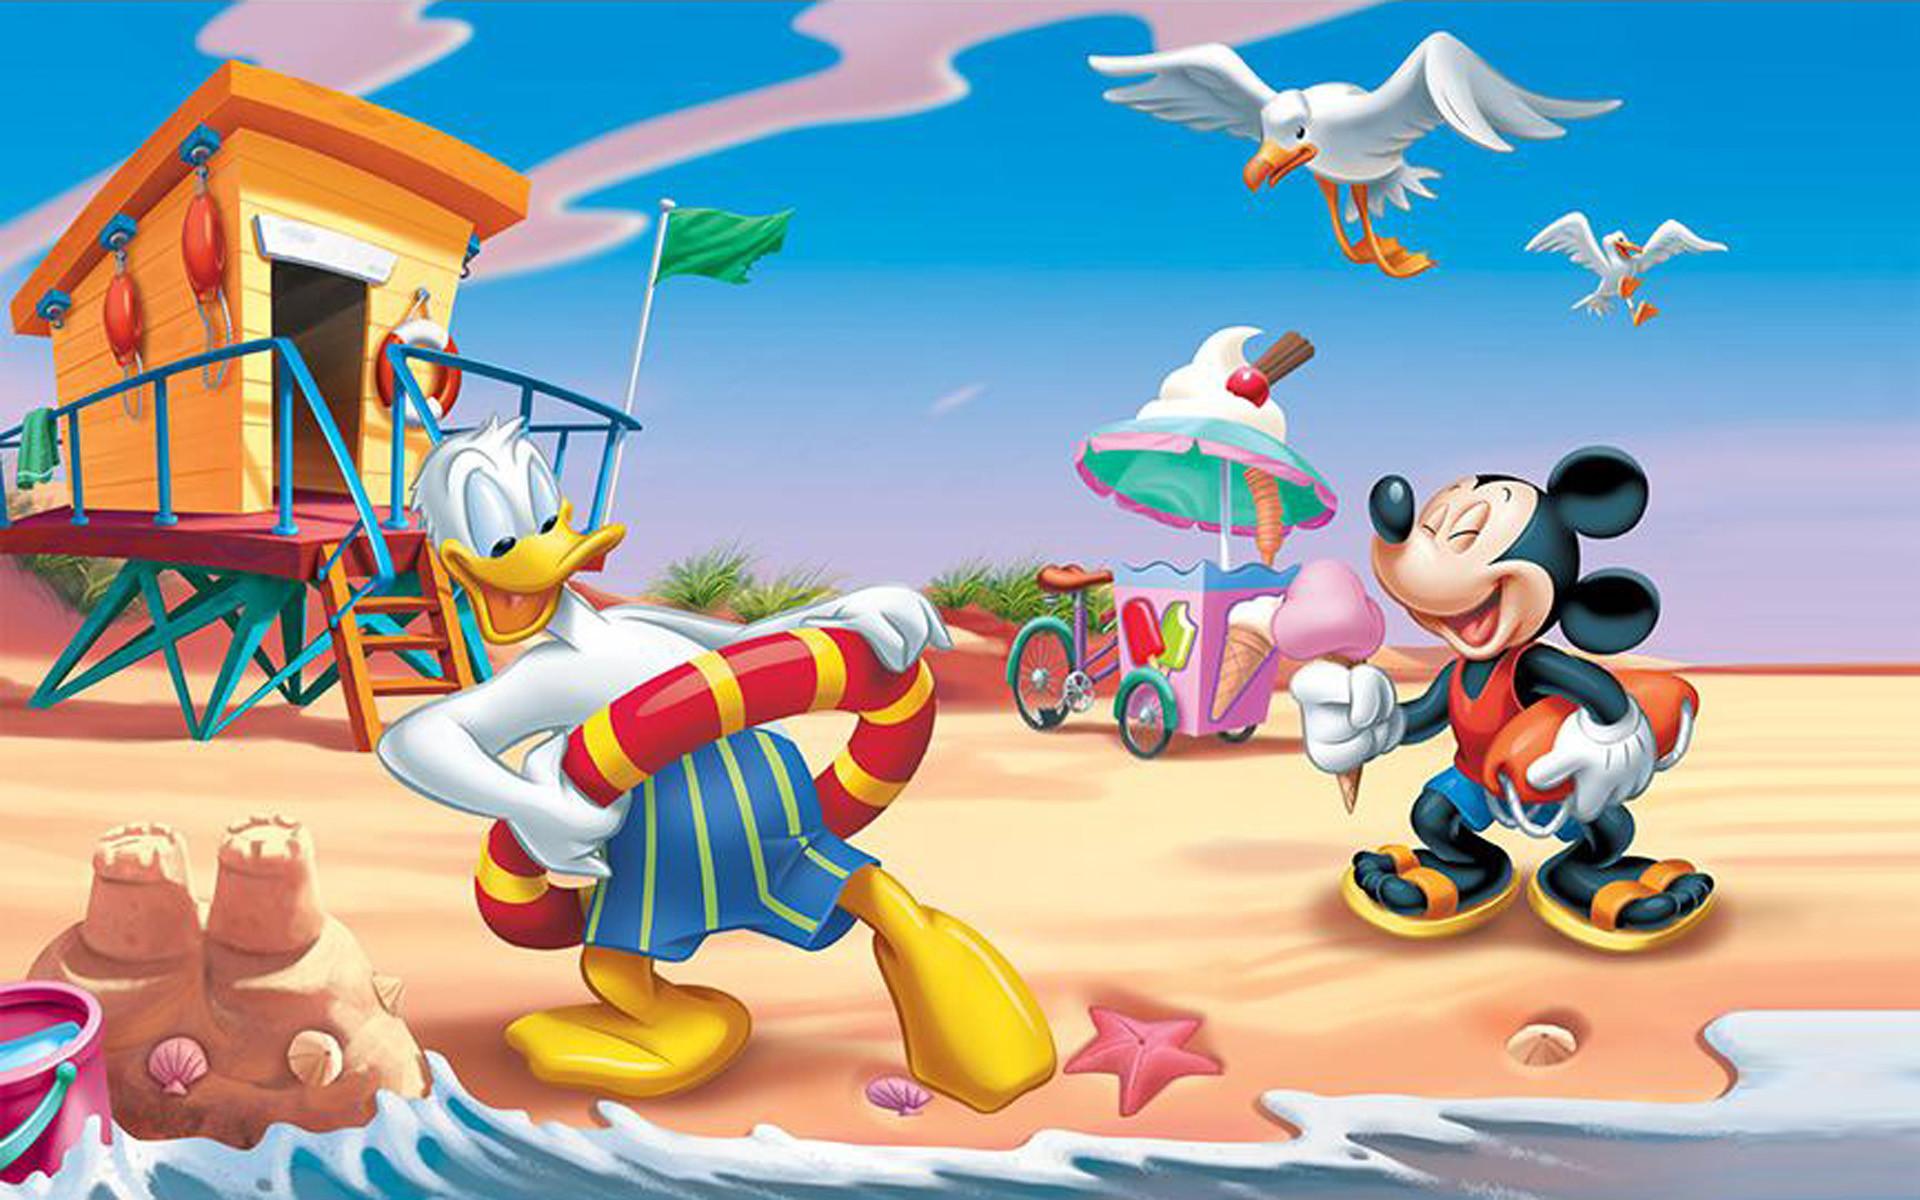 Donald duck wallpaper 57 images - Donald duck wallpapers for desktop ...